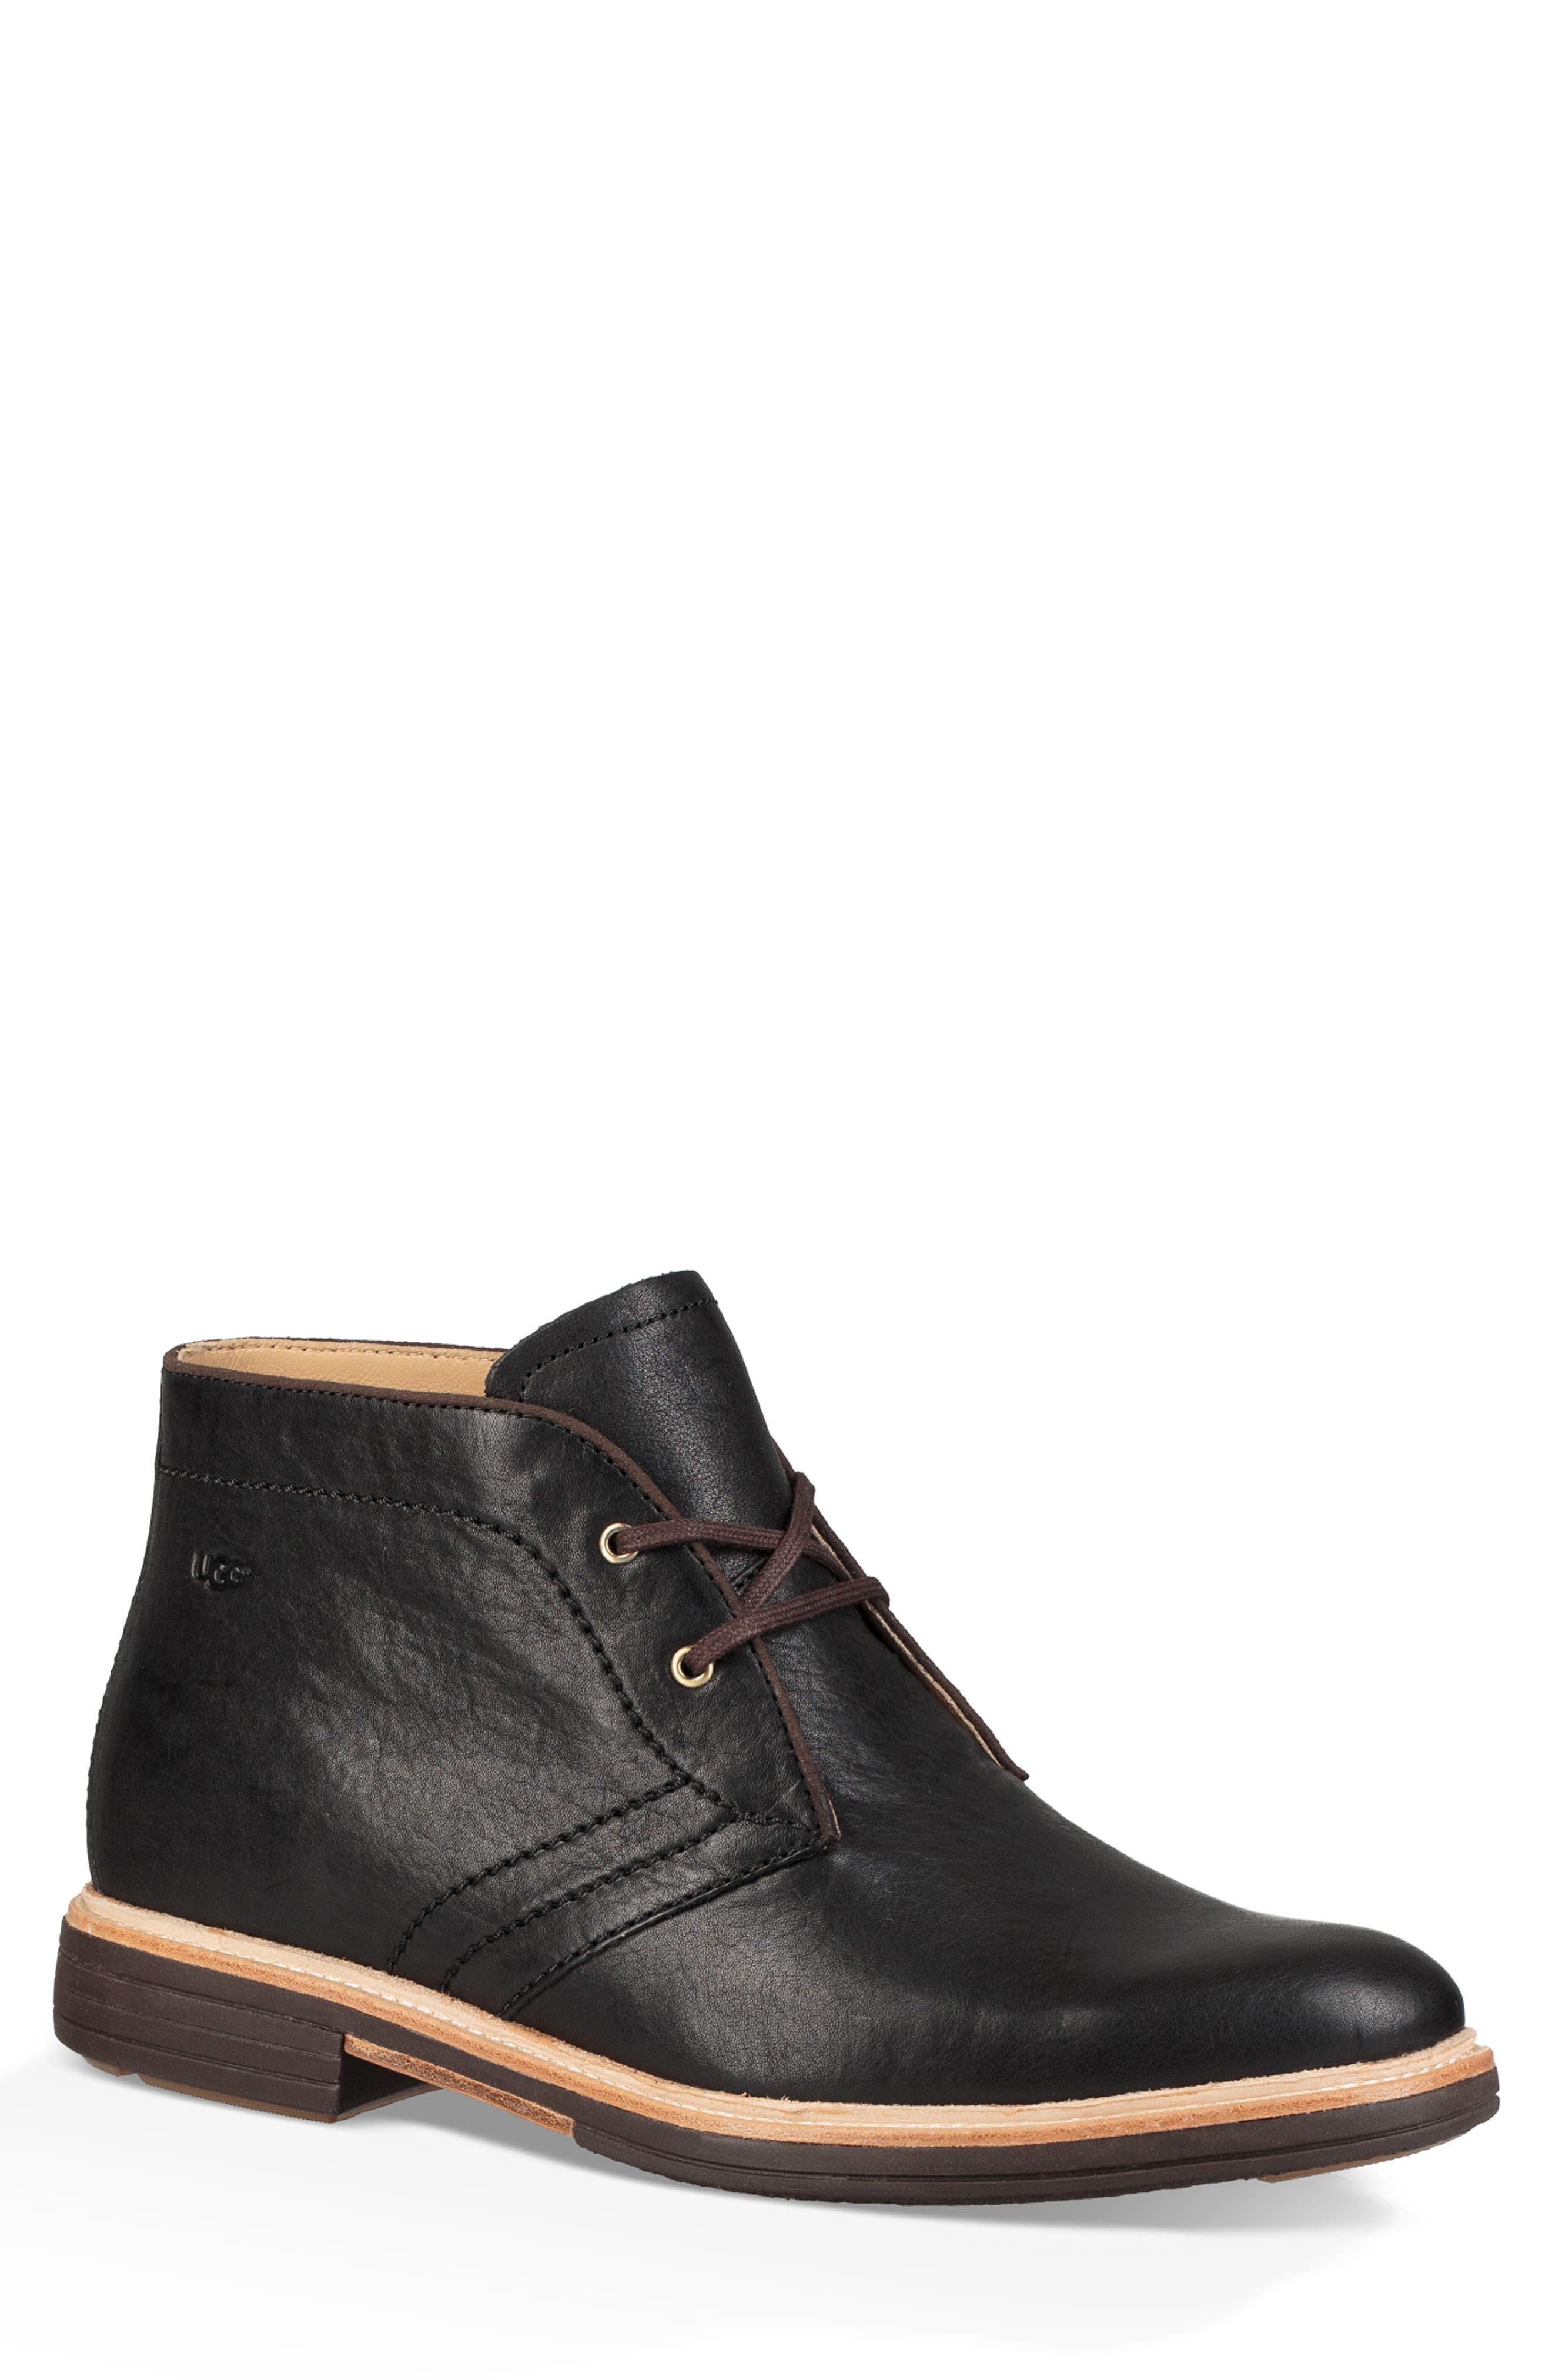 UGG<SUP>®</SUP>, Australia Dagmann Chukka Boot, Main thumbnail 1, color, BLACK LEATHER/SUEDE